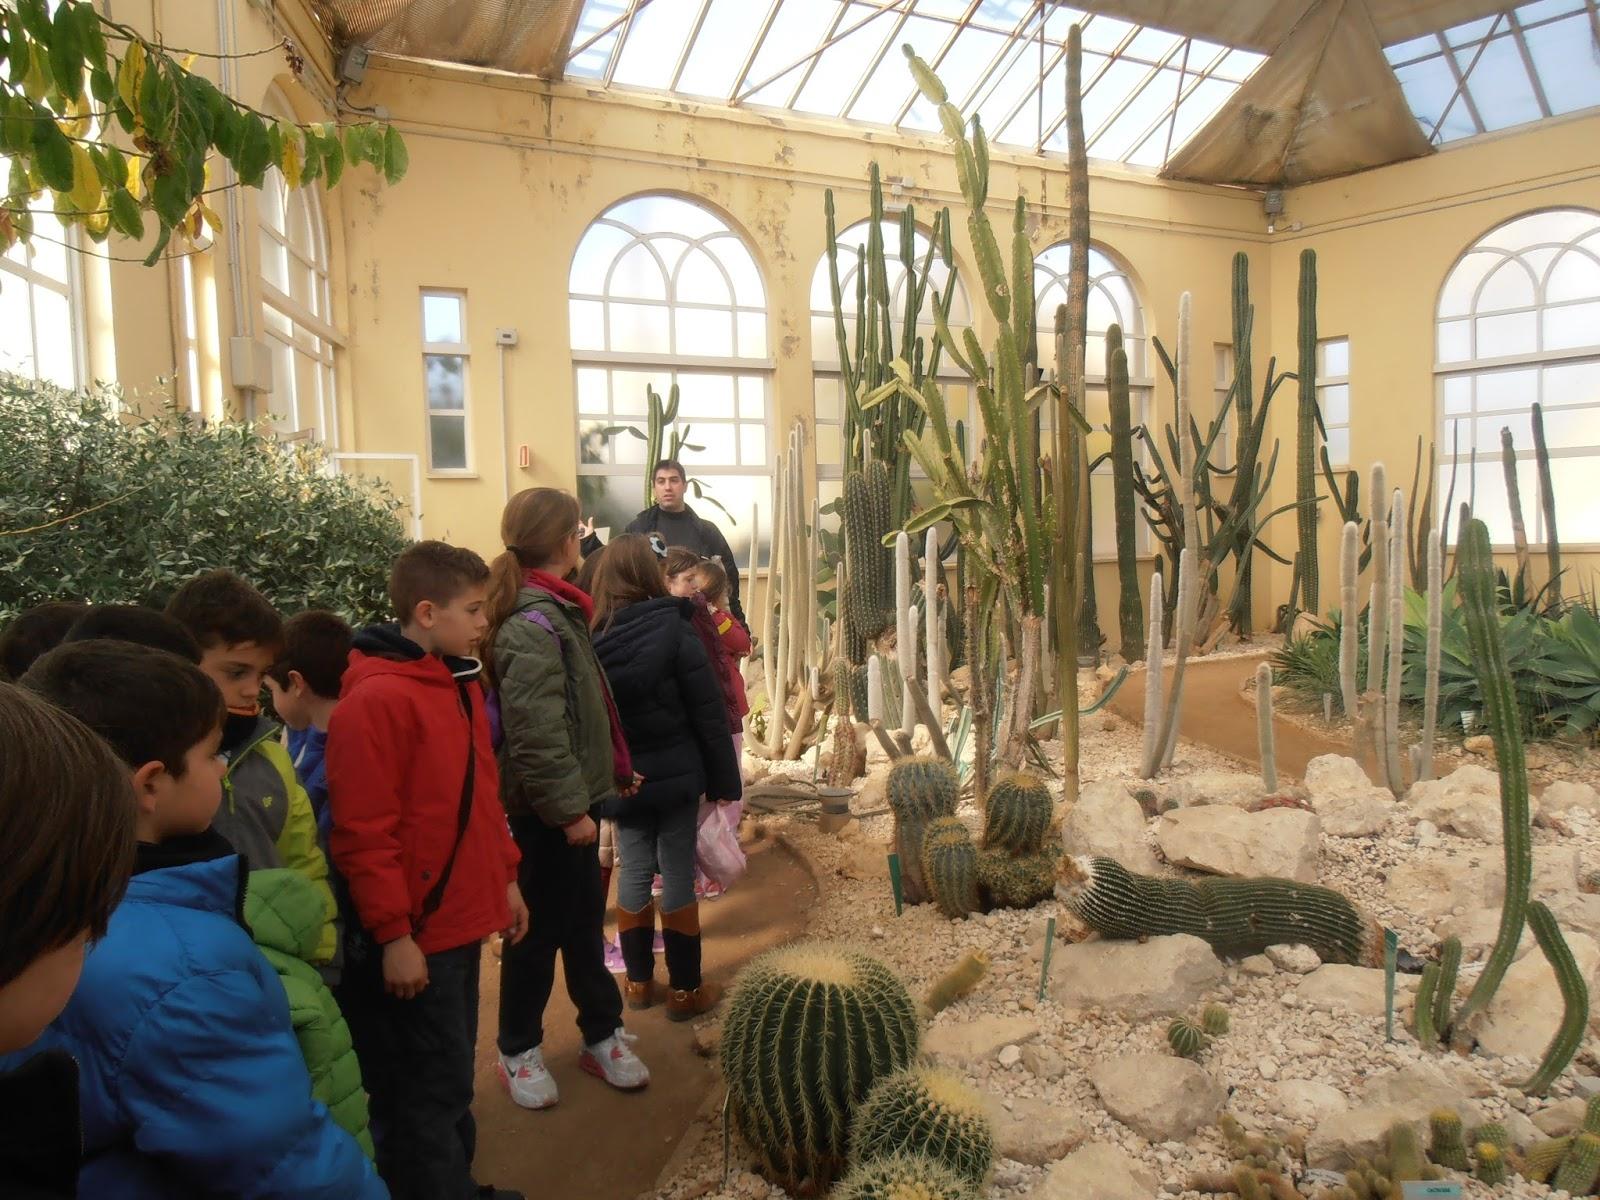 Ceip andaluc a c rdoba vista al huerto del jard n for Ceip jardin botanico